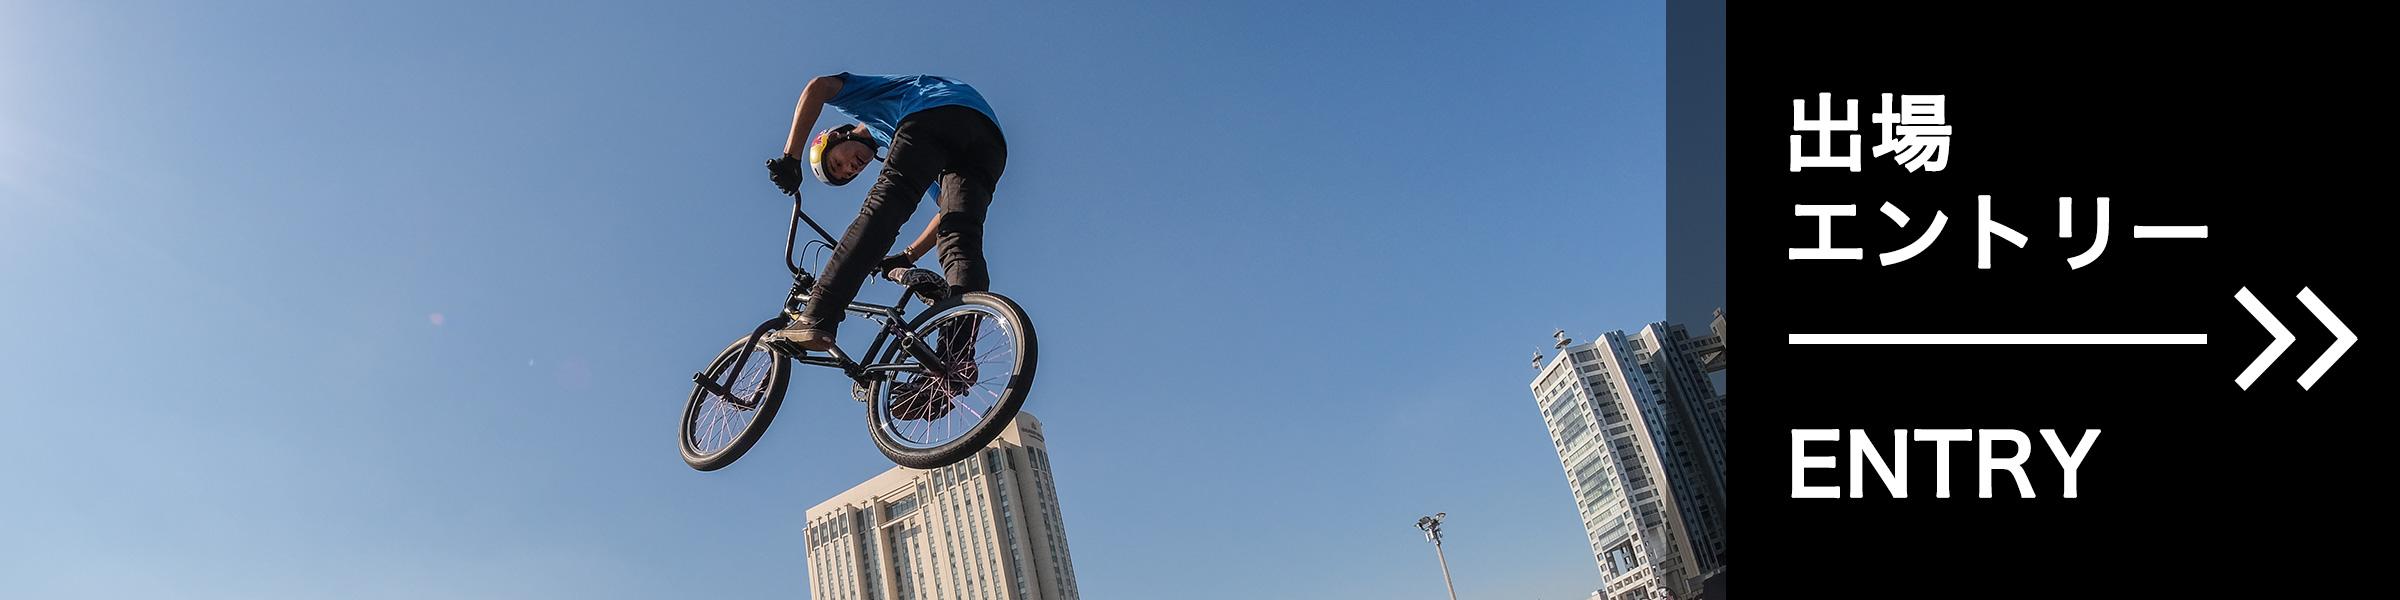 CHIMERA-A-SIDE2019のENTRYページ画像:BMX Freestyle Park BMXフリースタイルパーク